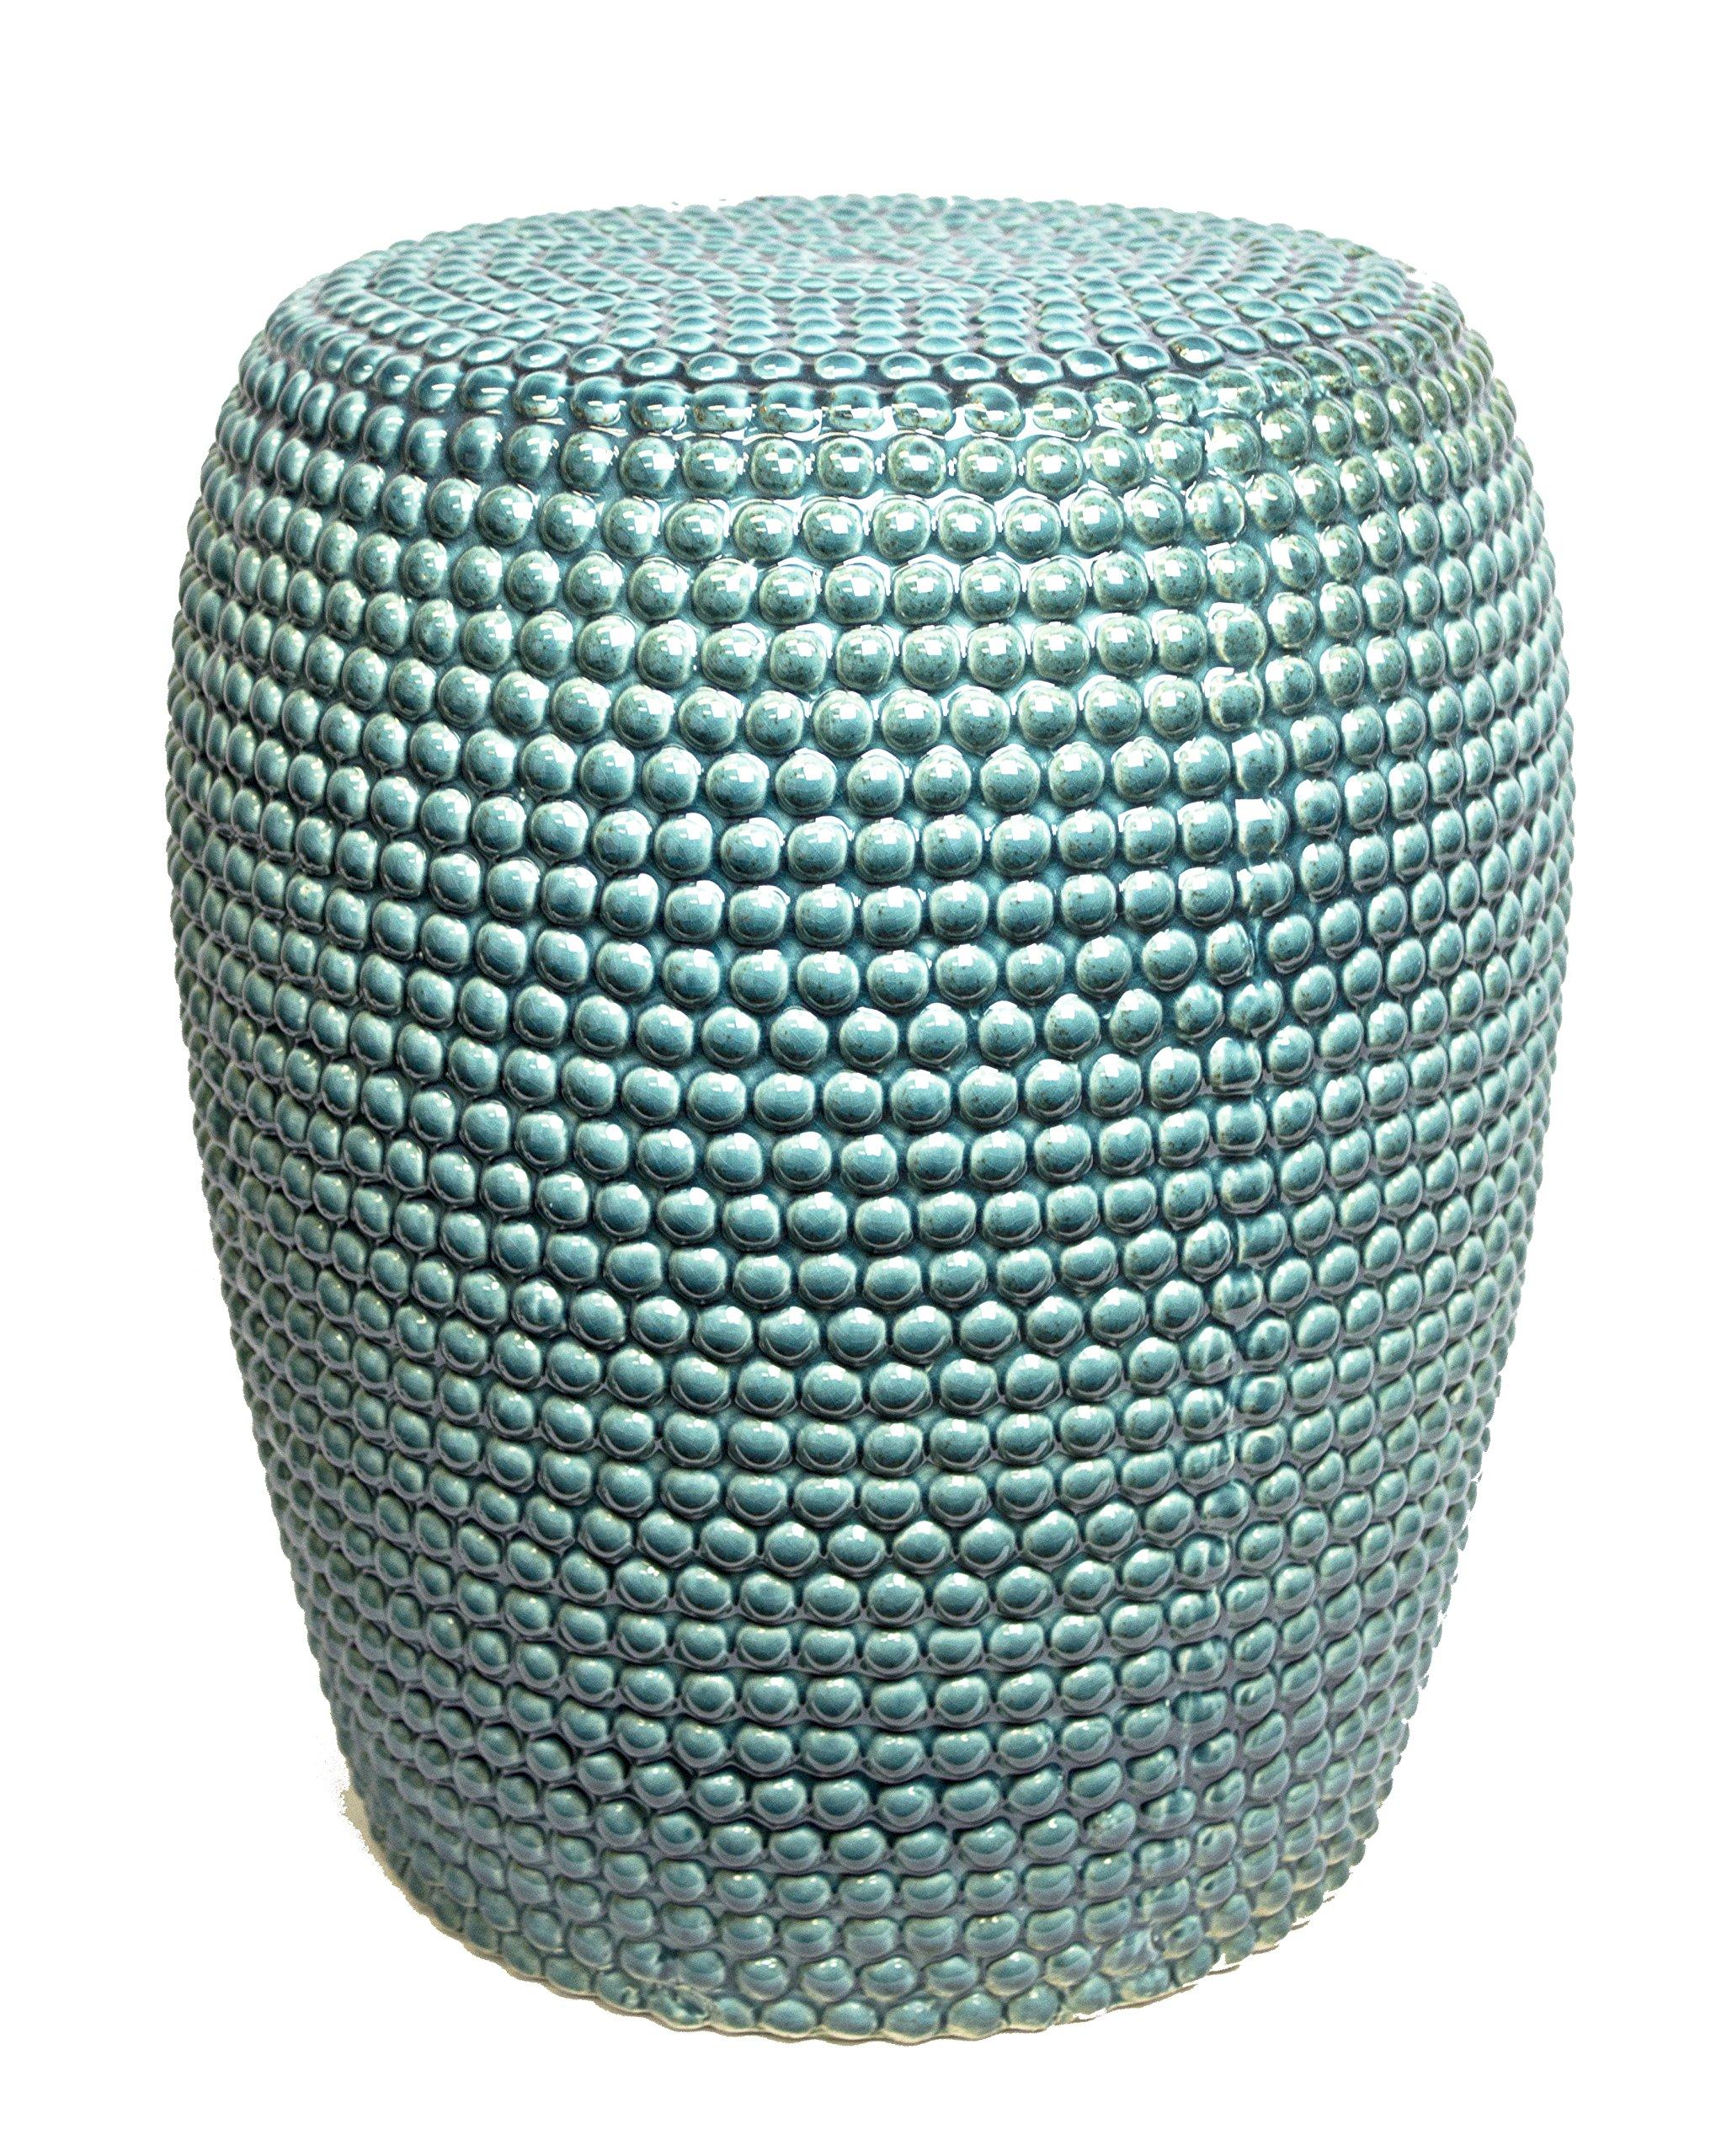 Sagebrook Home FC10247-01 Bead Texture Ceramic Garden Stool, Teal Ceramic, 15 x 15 x 18.5 Inches by Sagebrook Home